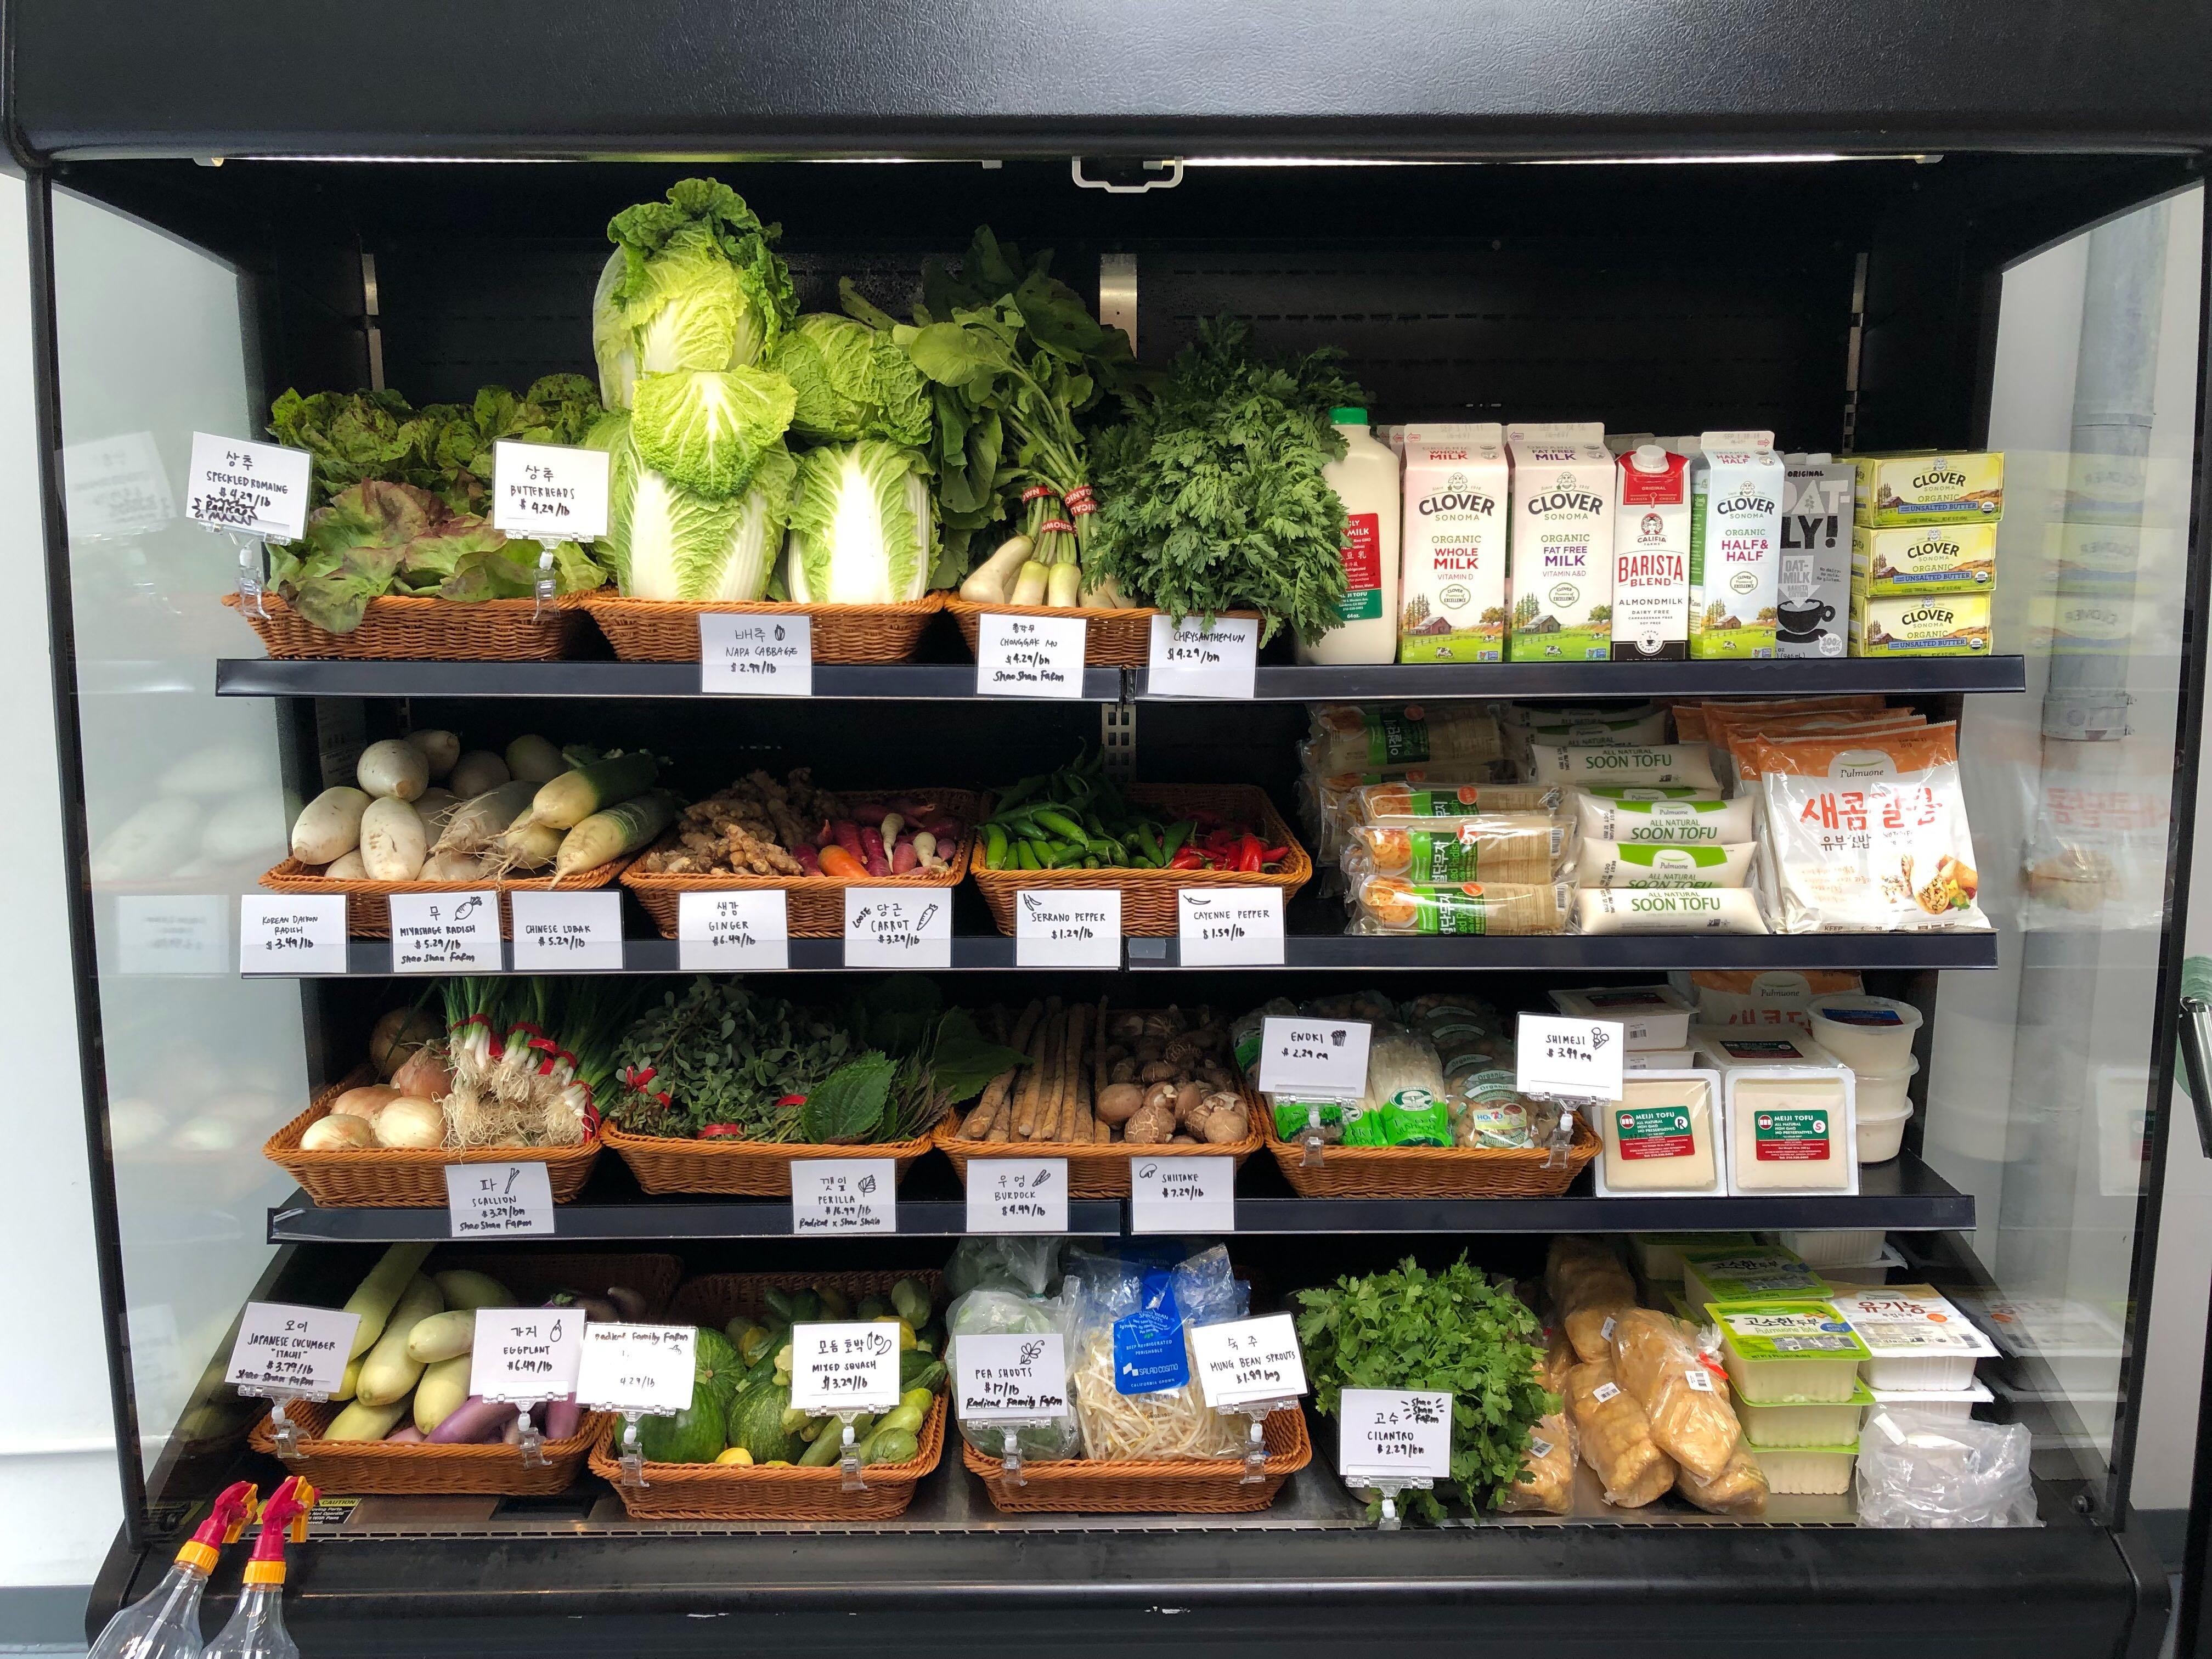 A shelf of produce at a market